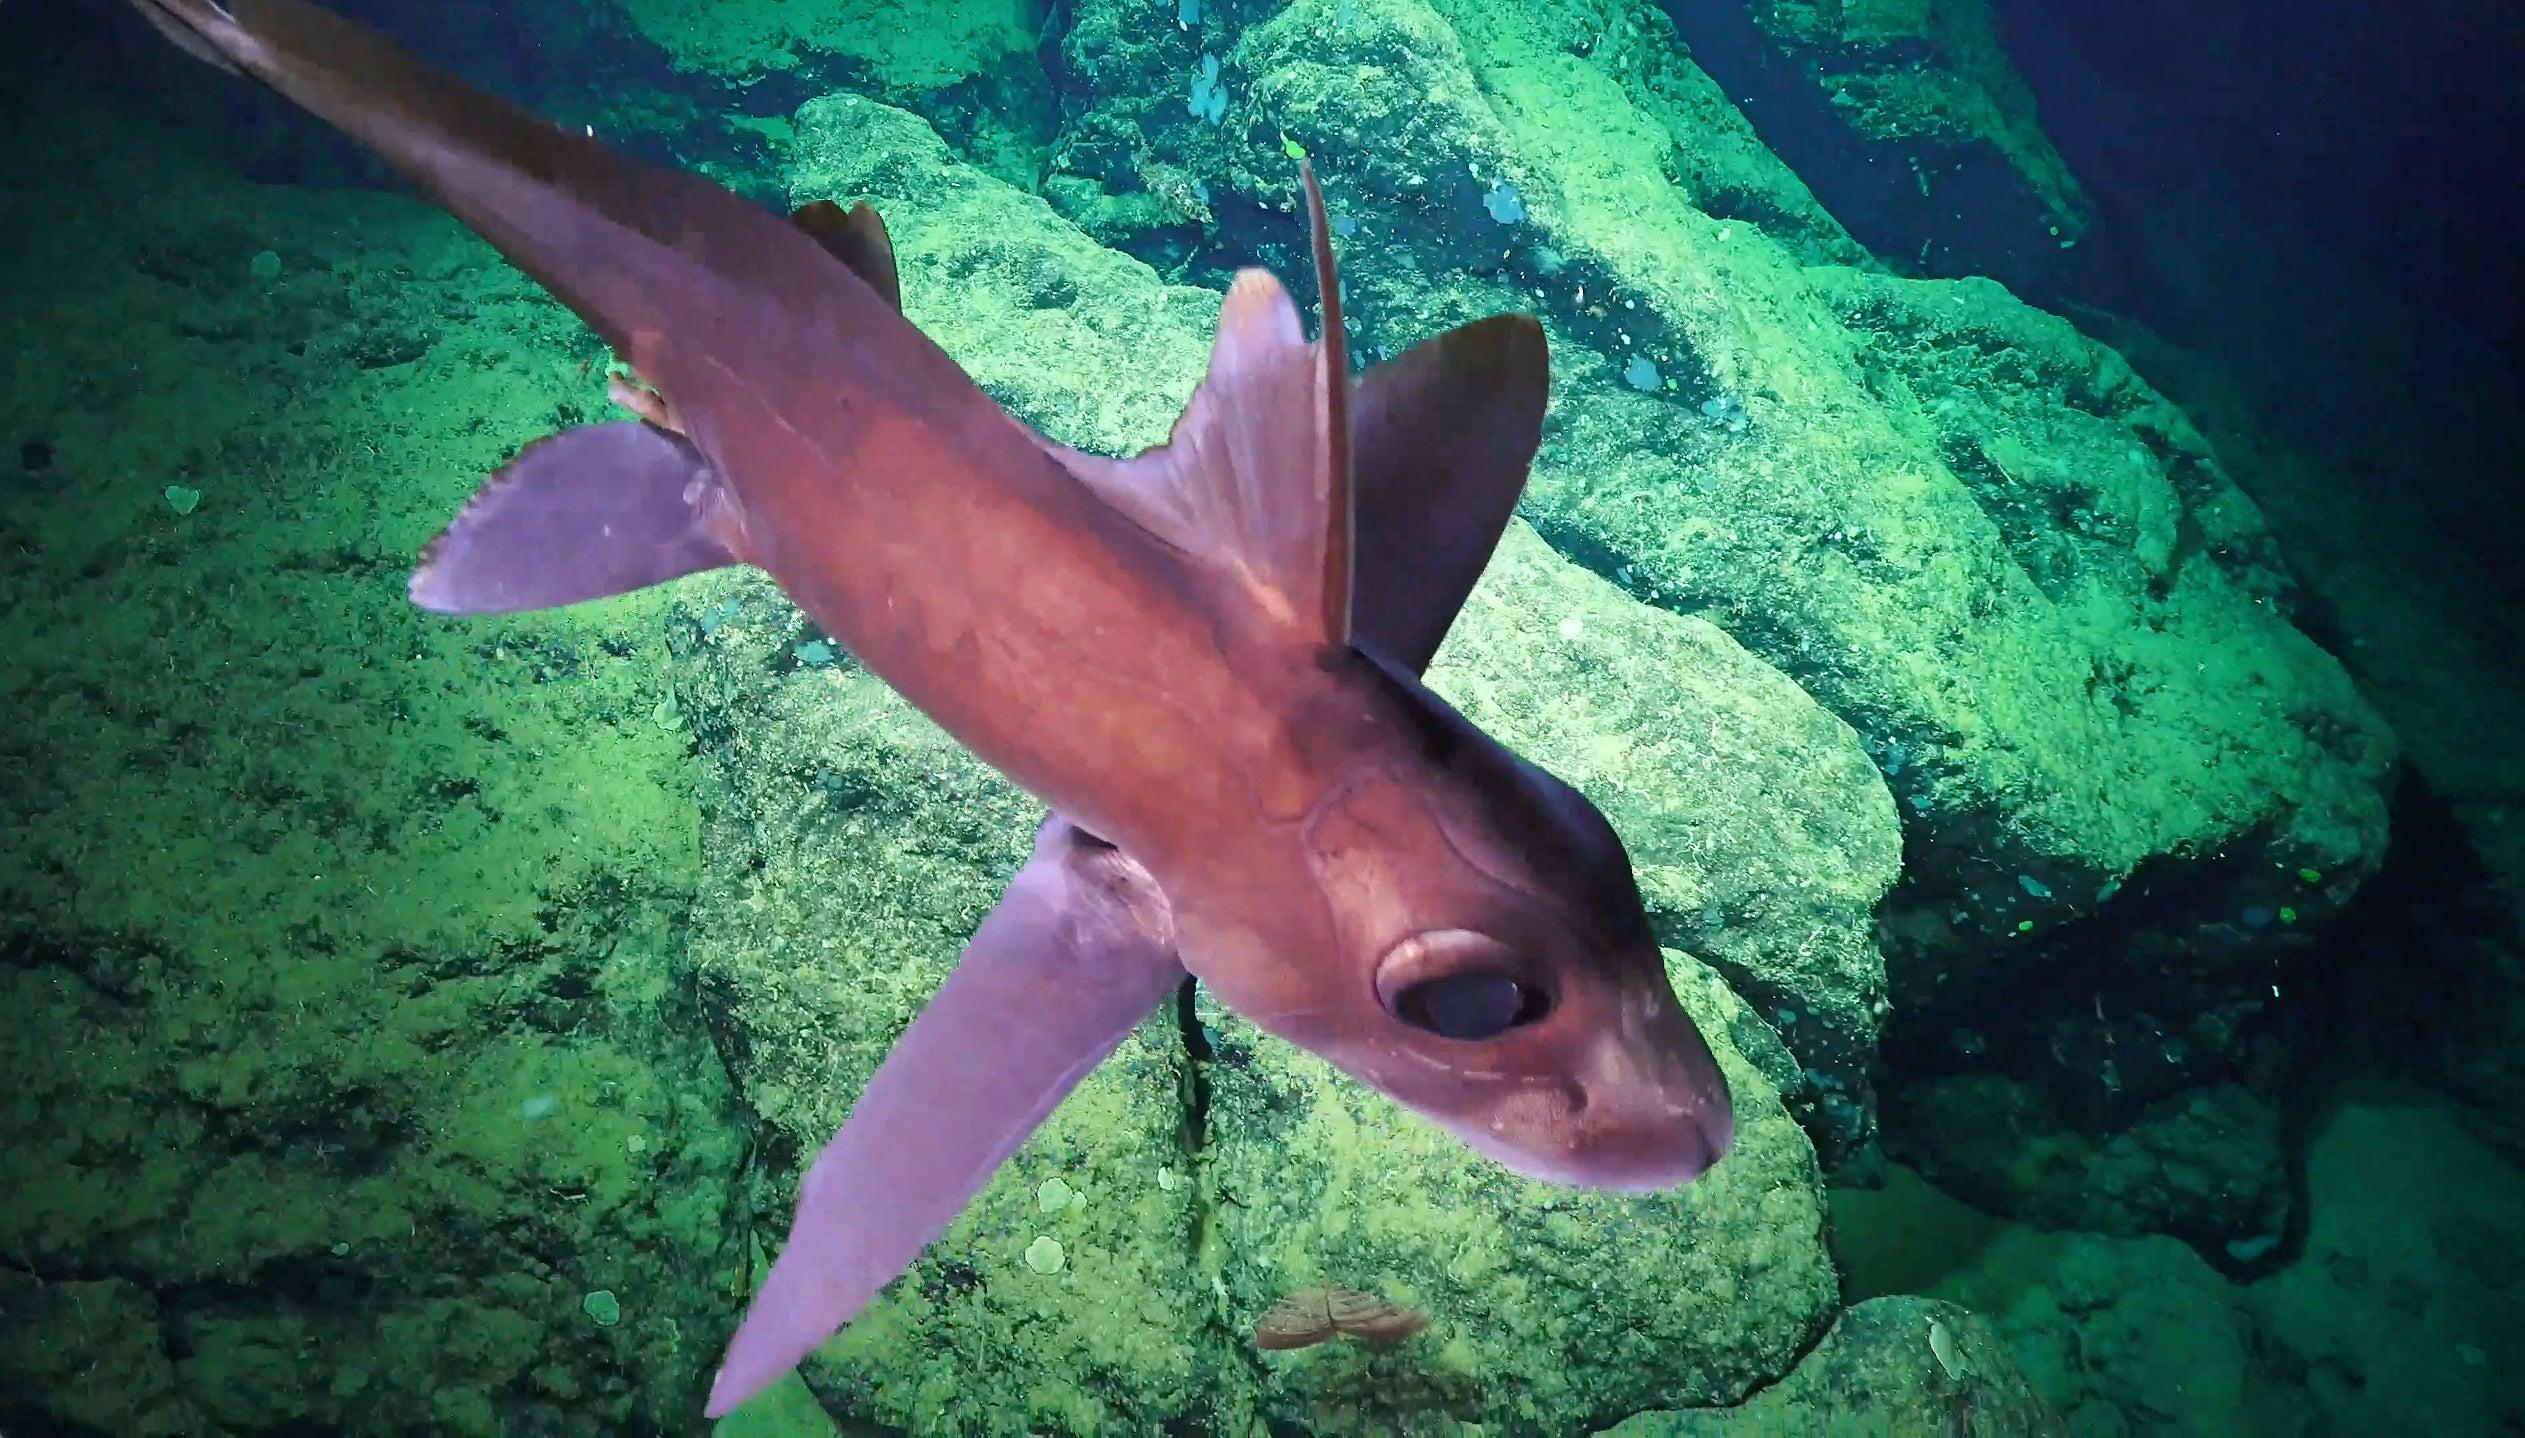 Spooky New Photos Show The Alien Creatures Of The Deep Ocean